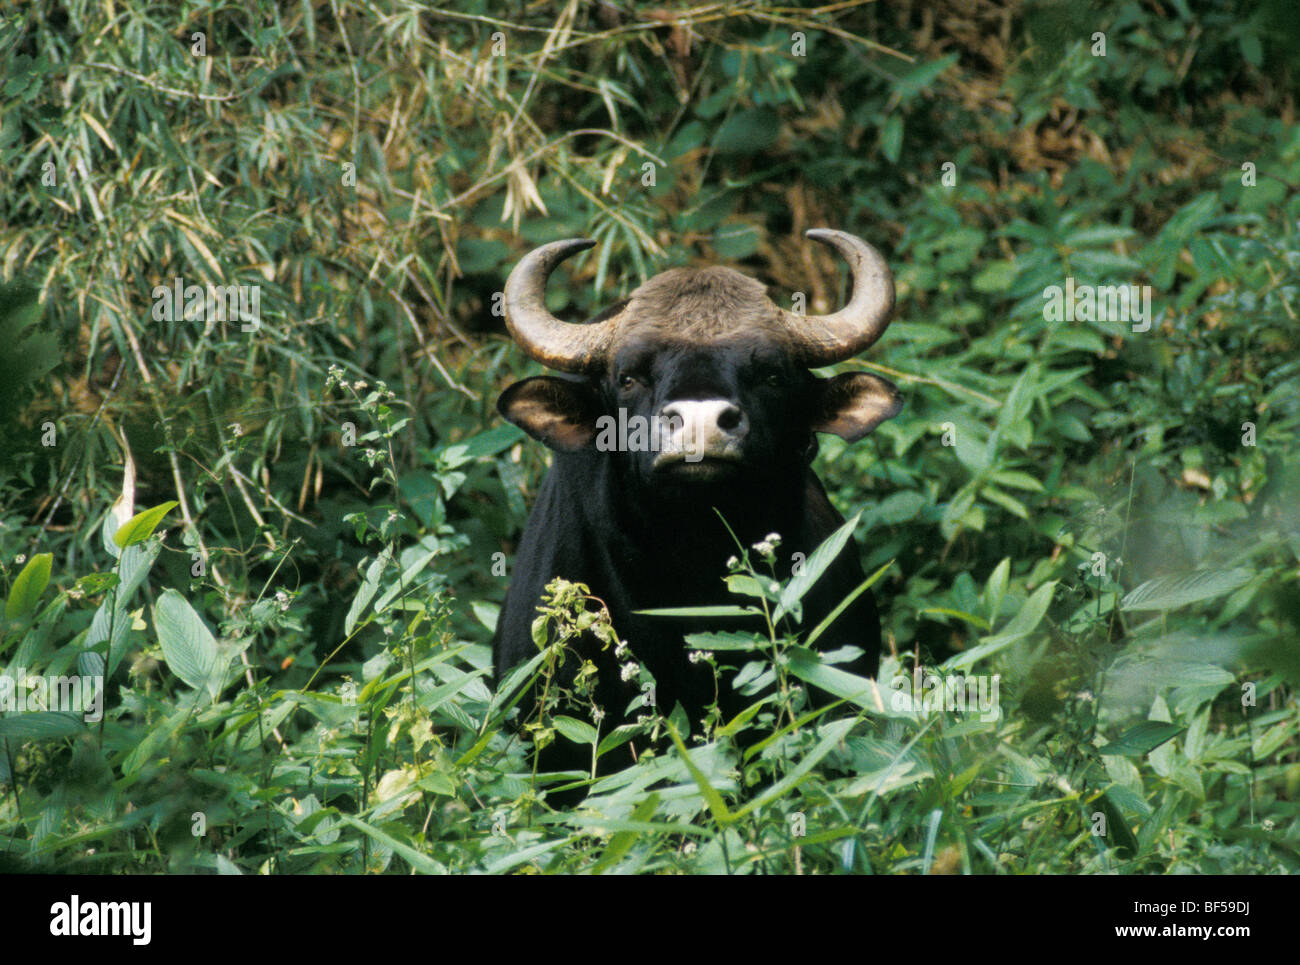 Gaur (Bos gaurus), male, Nilgiri mountains, Western Ghats, South India, India, Asia - Stock Image